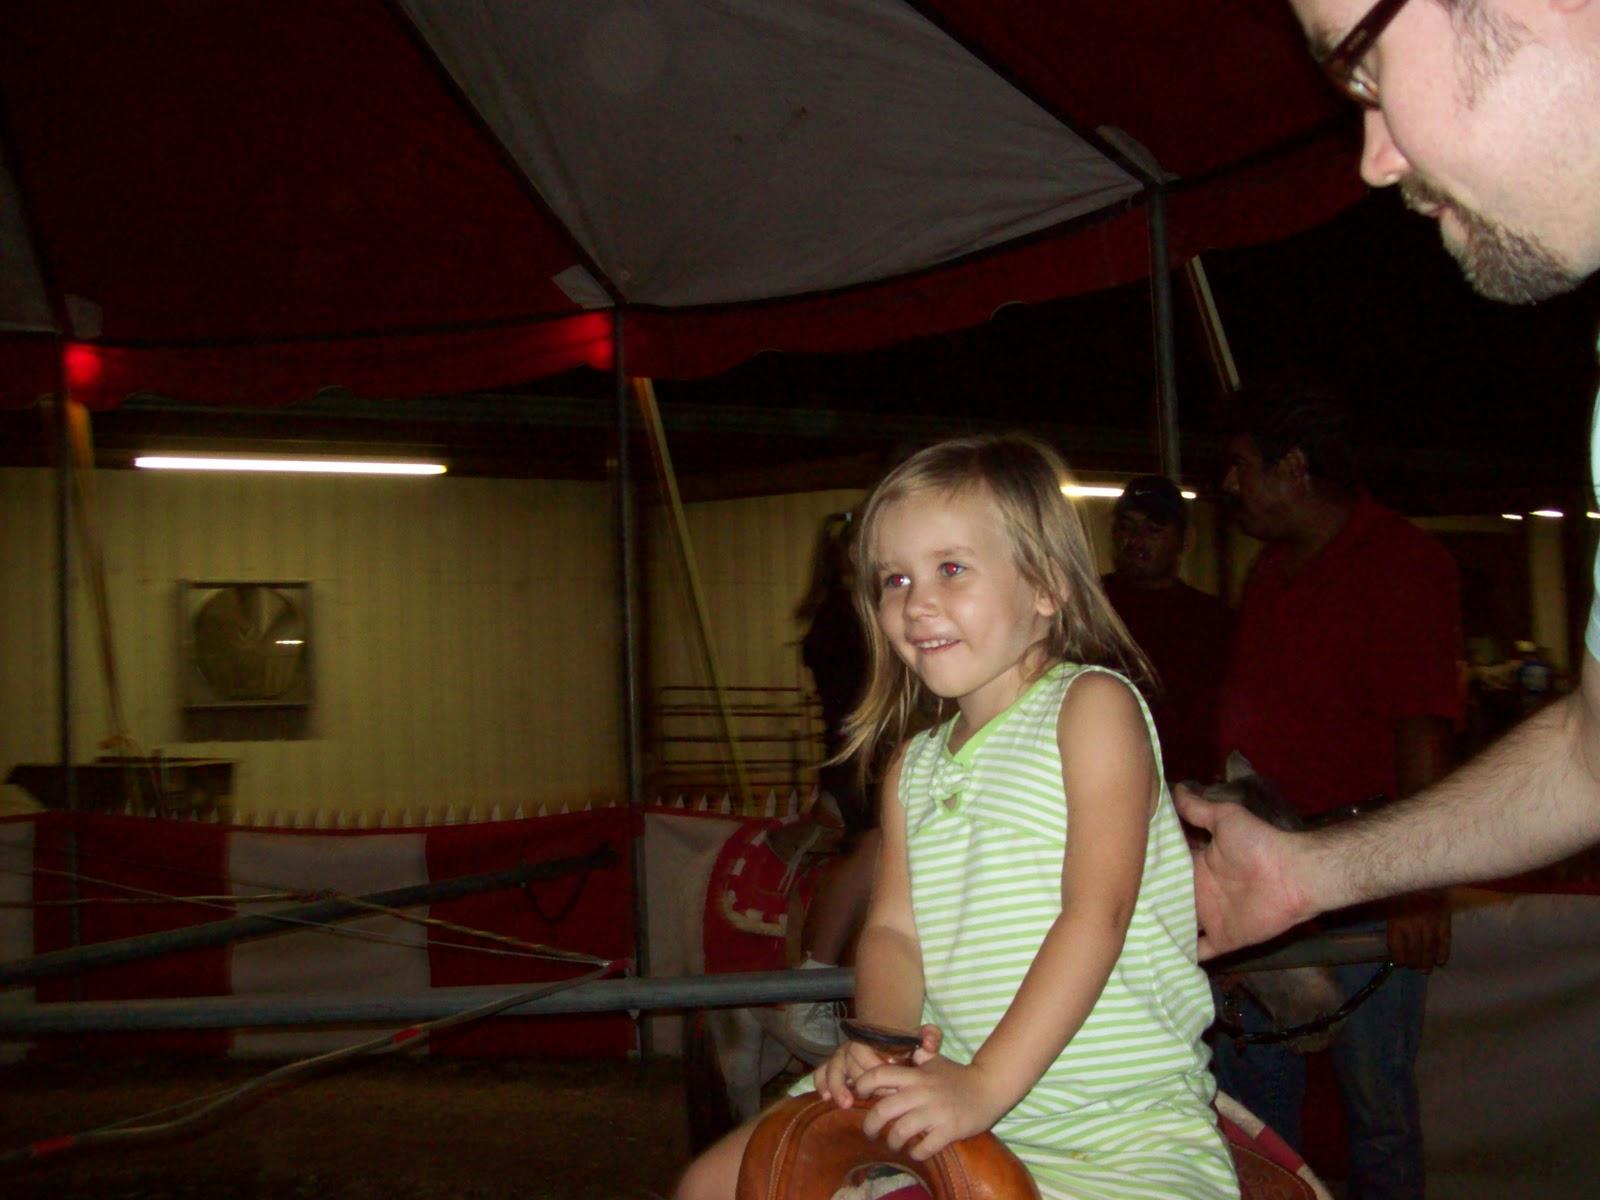 Fort Bend County Fair 2008 - 101_0470.JPG